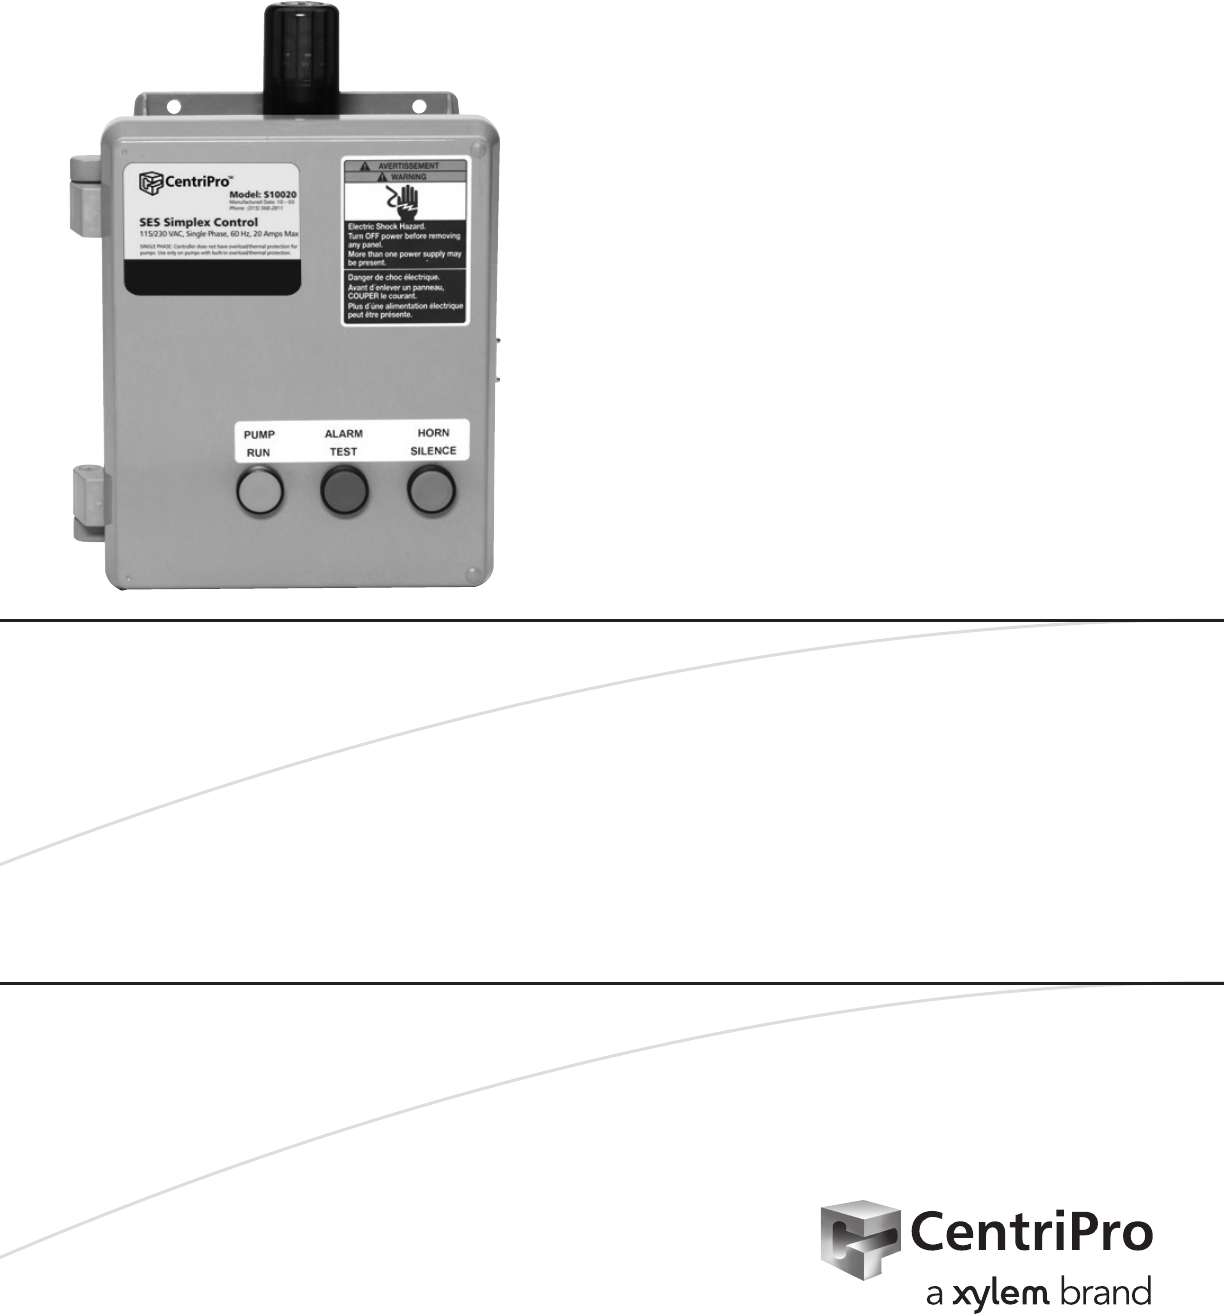 Centripro Automatic Pump Control Manual